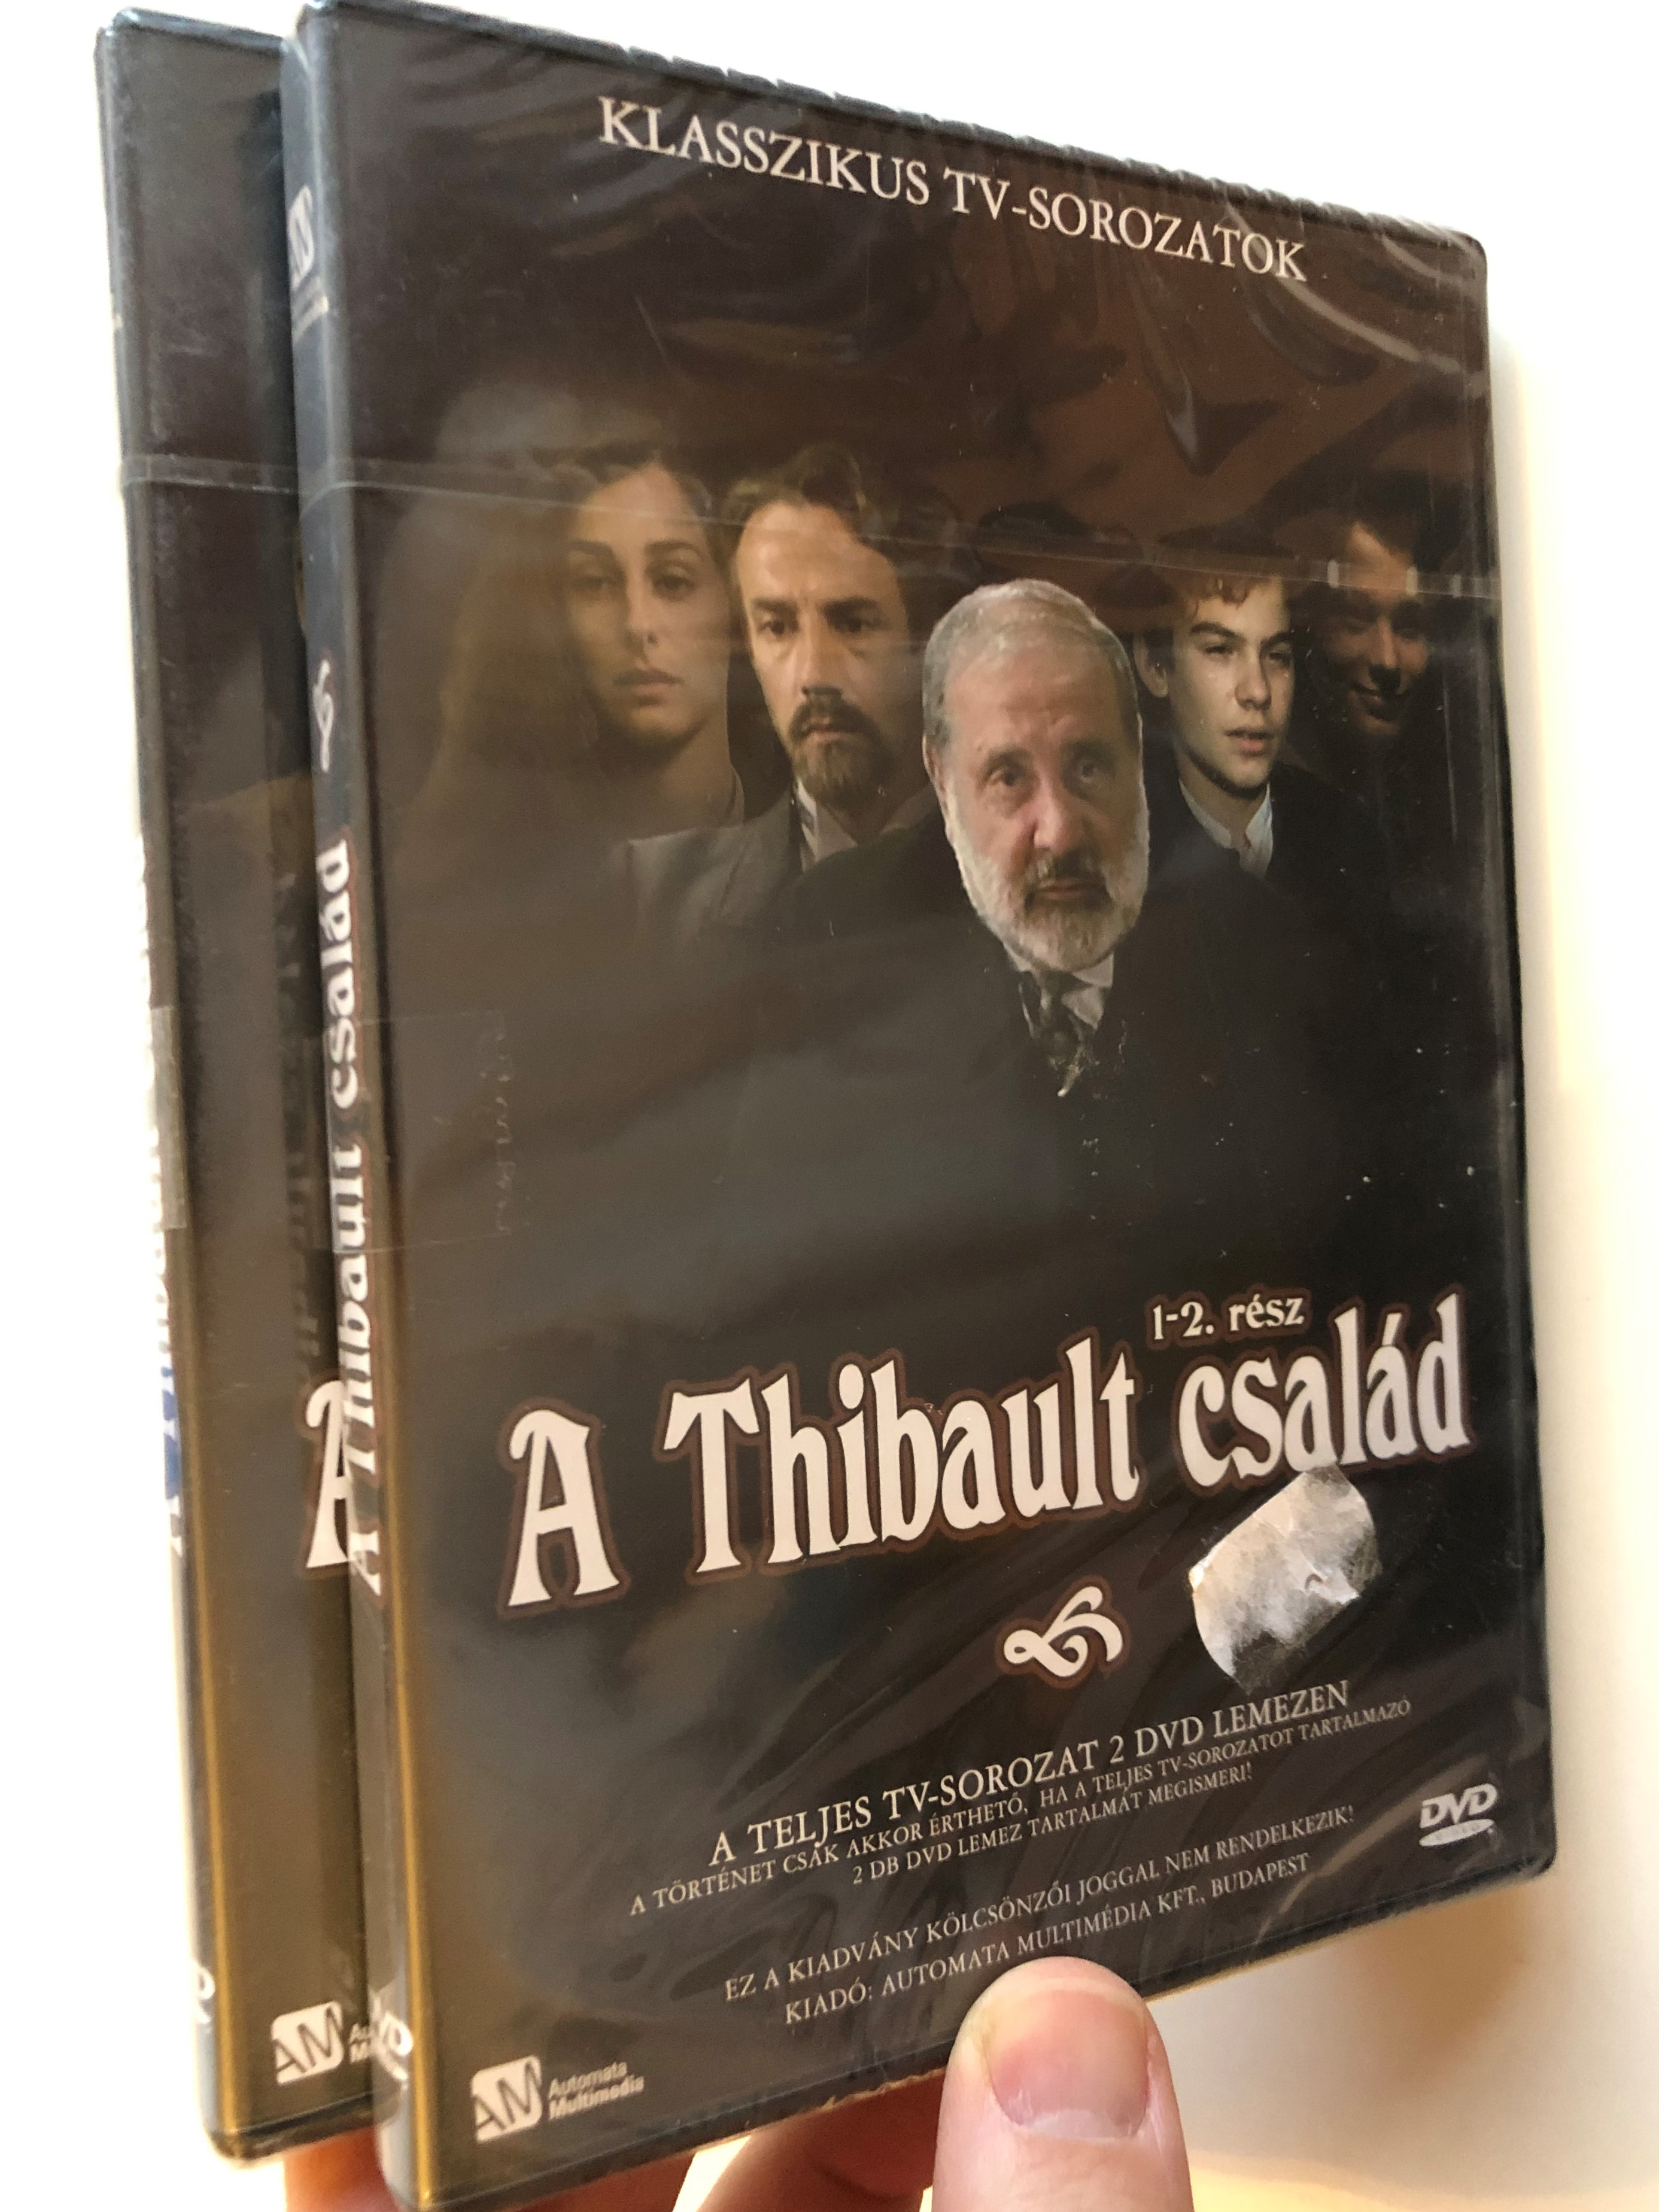 -les-thibault-dvd-2003-a-thibault-csal-d-directed-by-jean-daniel-verhaeghe-starring-jean-yanne-jean-pierre-lorit-geordy-monfil-didier-bezace-french-tv-miniseries-516752004-.jpg